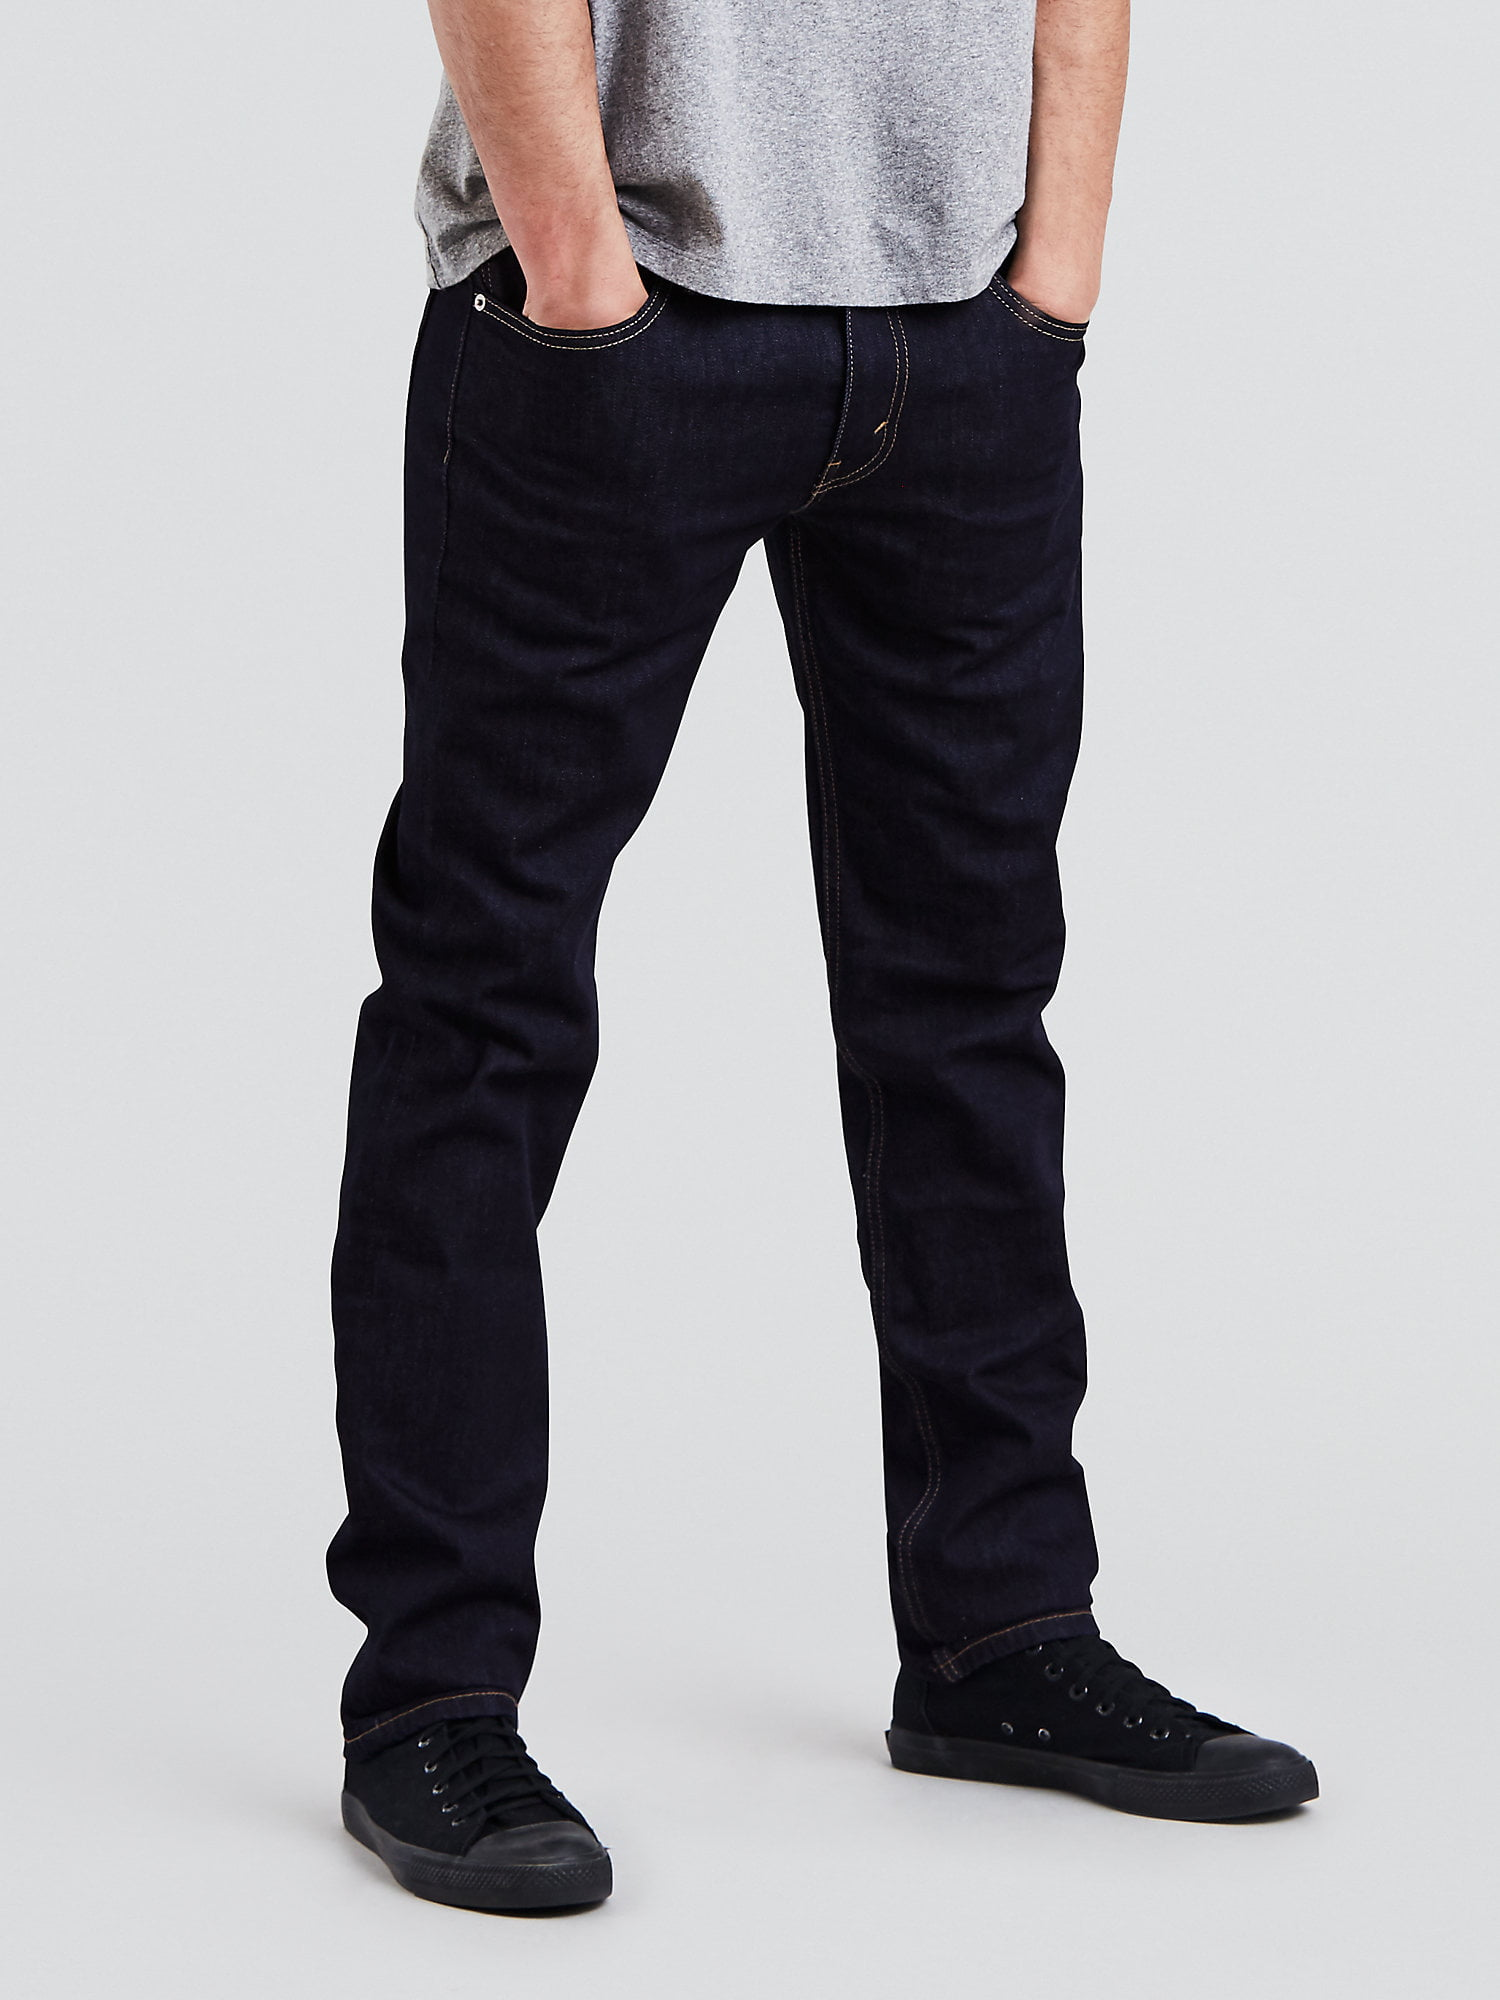 8b680a1b Levi's - Levi's Men's 511 Slim Fit Jeans - Walmart.com